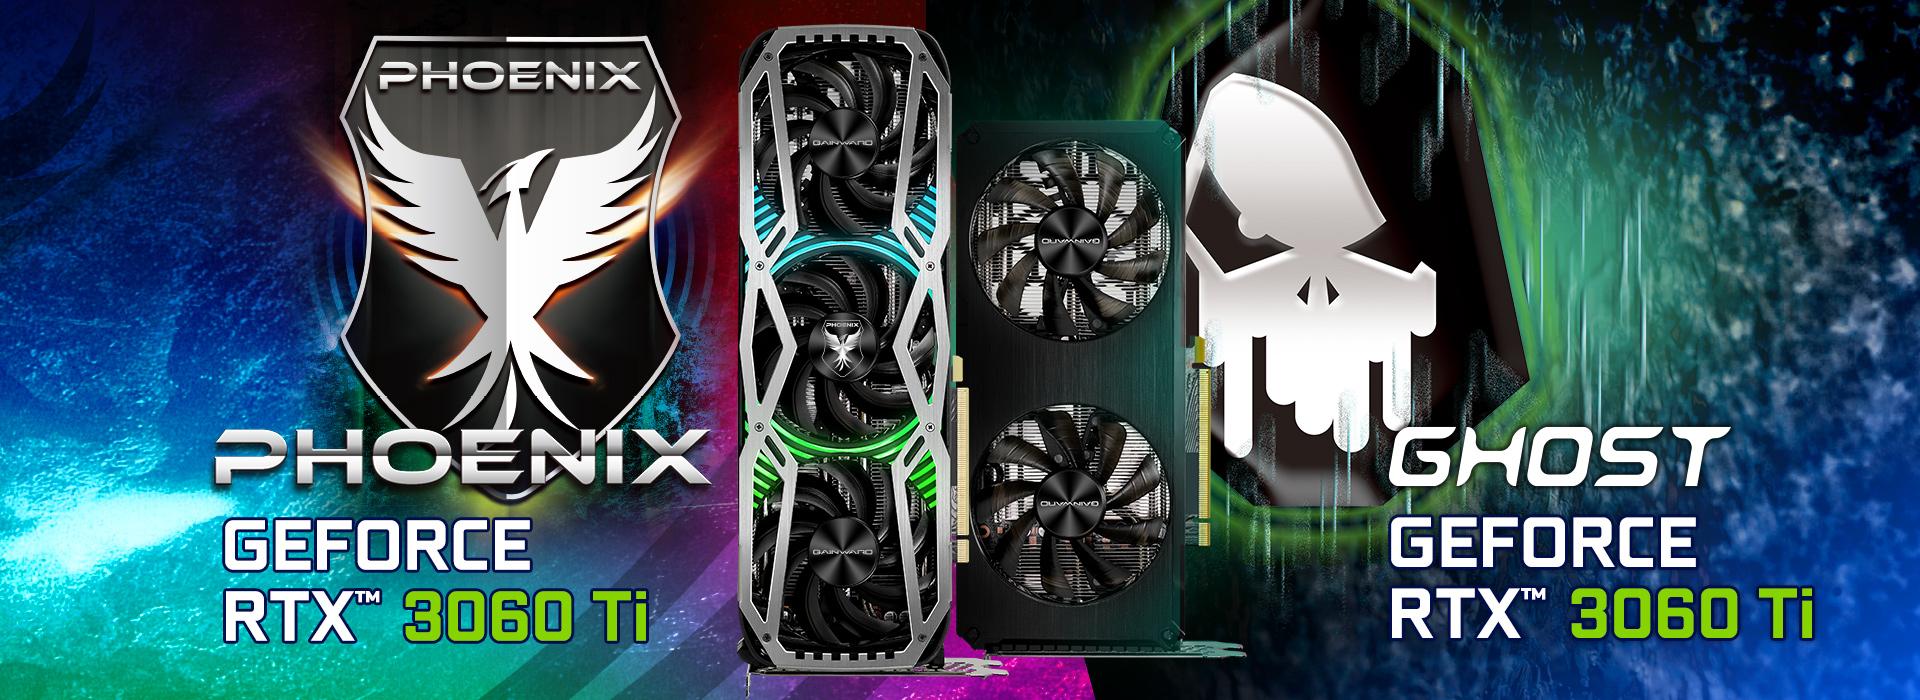 Gainward launches twelve GeForce RTX 3060 Ti graphics cards – VideoCardz.com